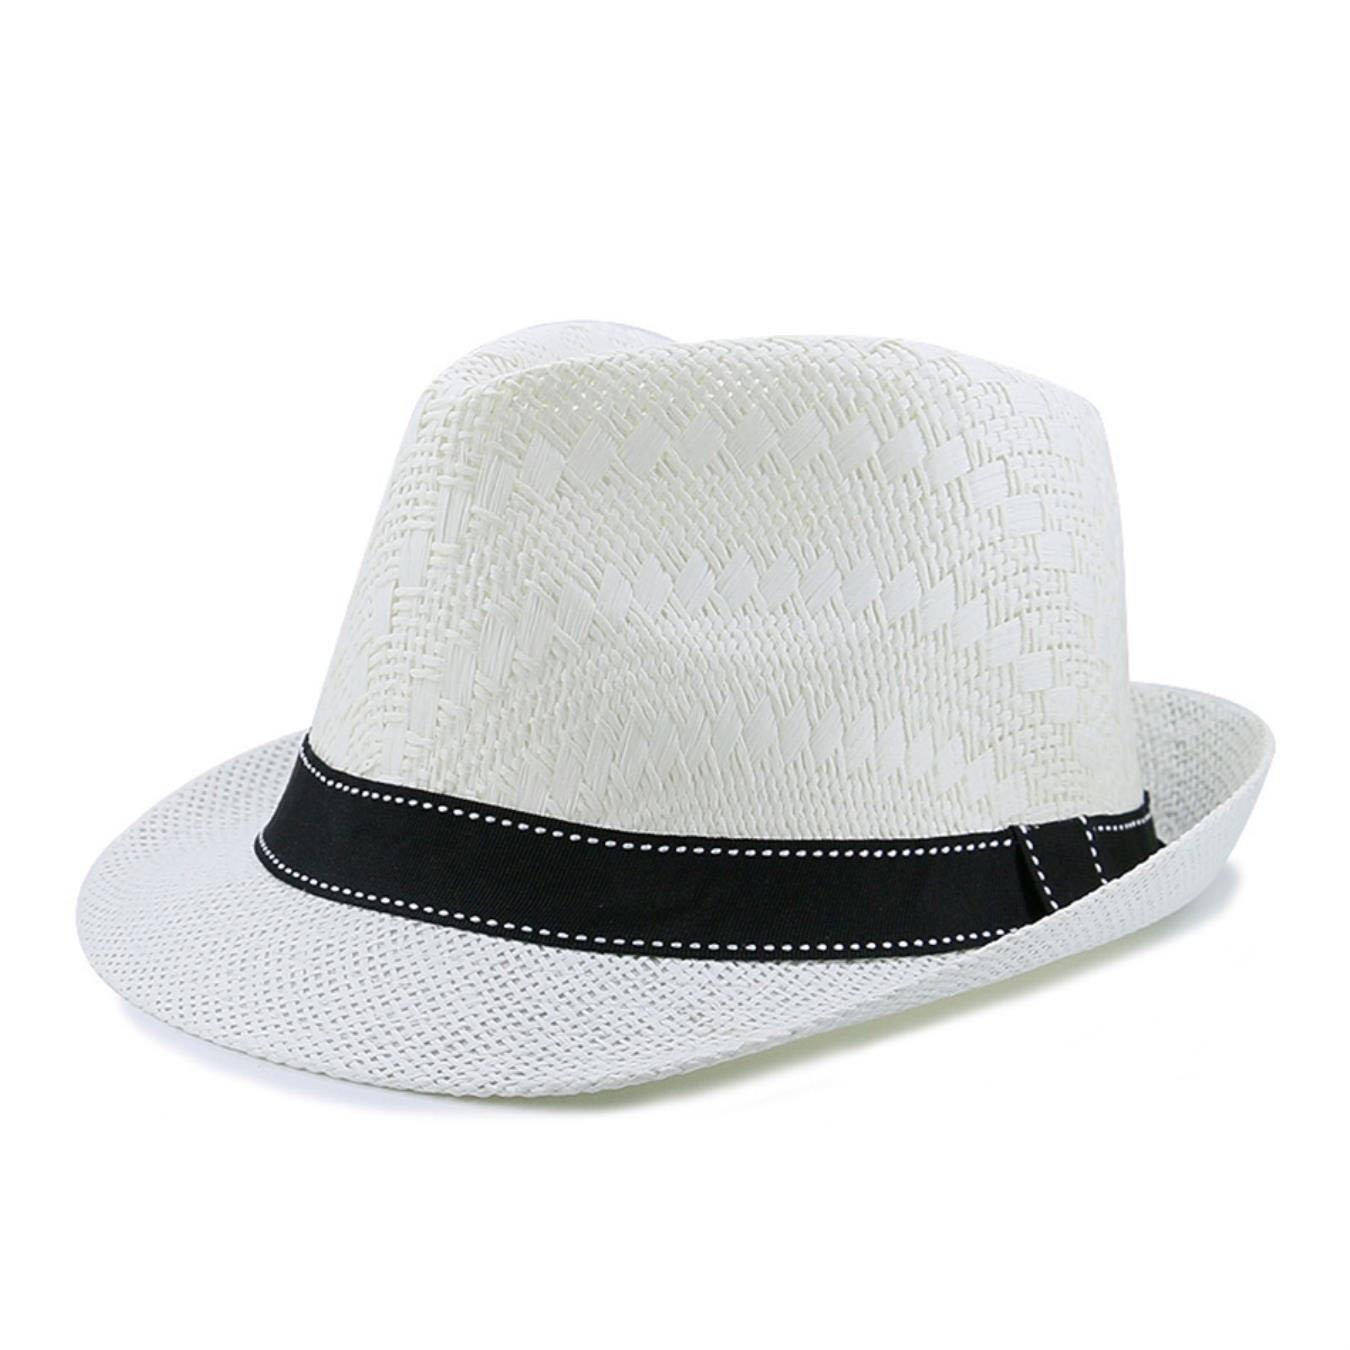 Summer Beach Sun Hat Women Designer Casual Fedora Straw Hat at Amazon  Women s Clothing store  5c79988927b